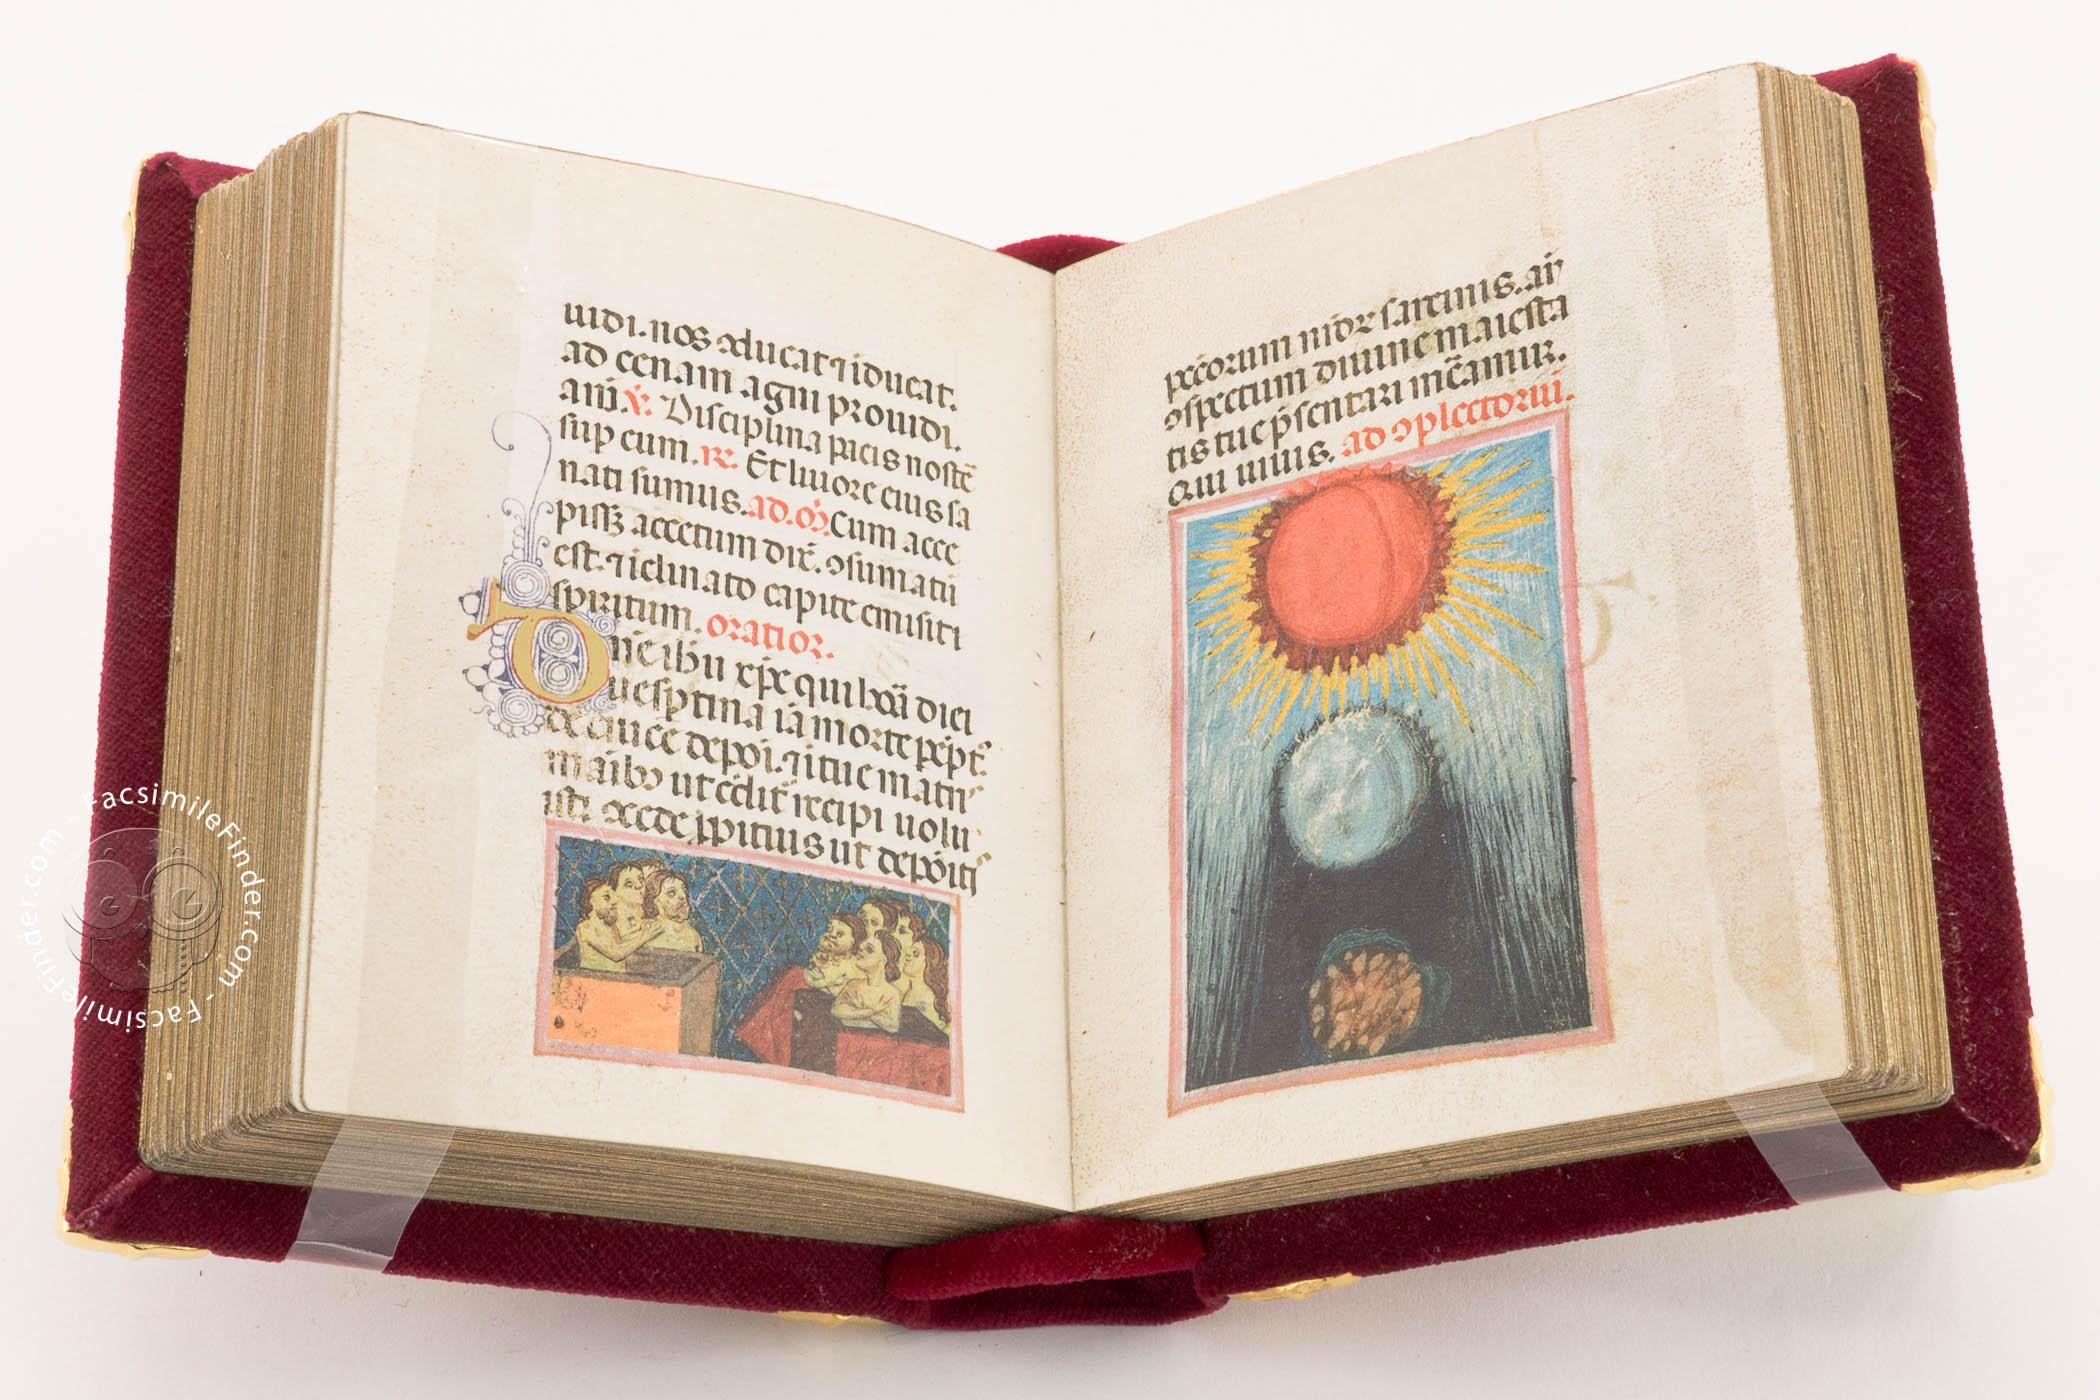 Officiolum of Francesco da Barberino « Facsimile edition